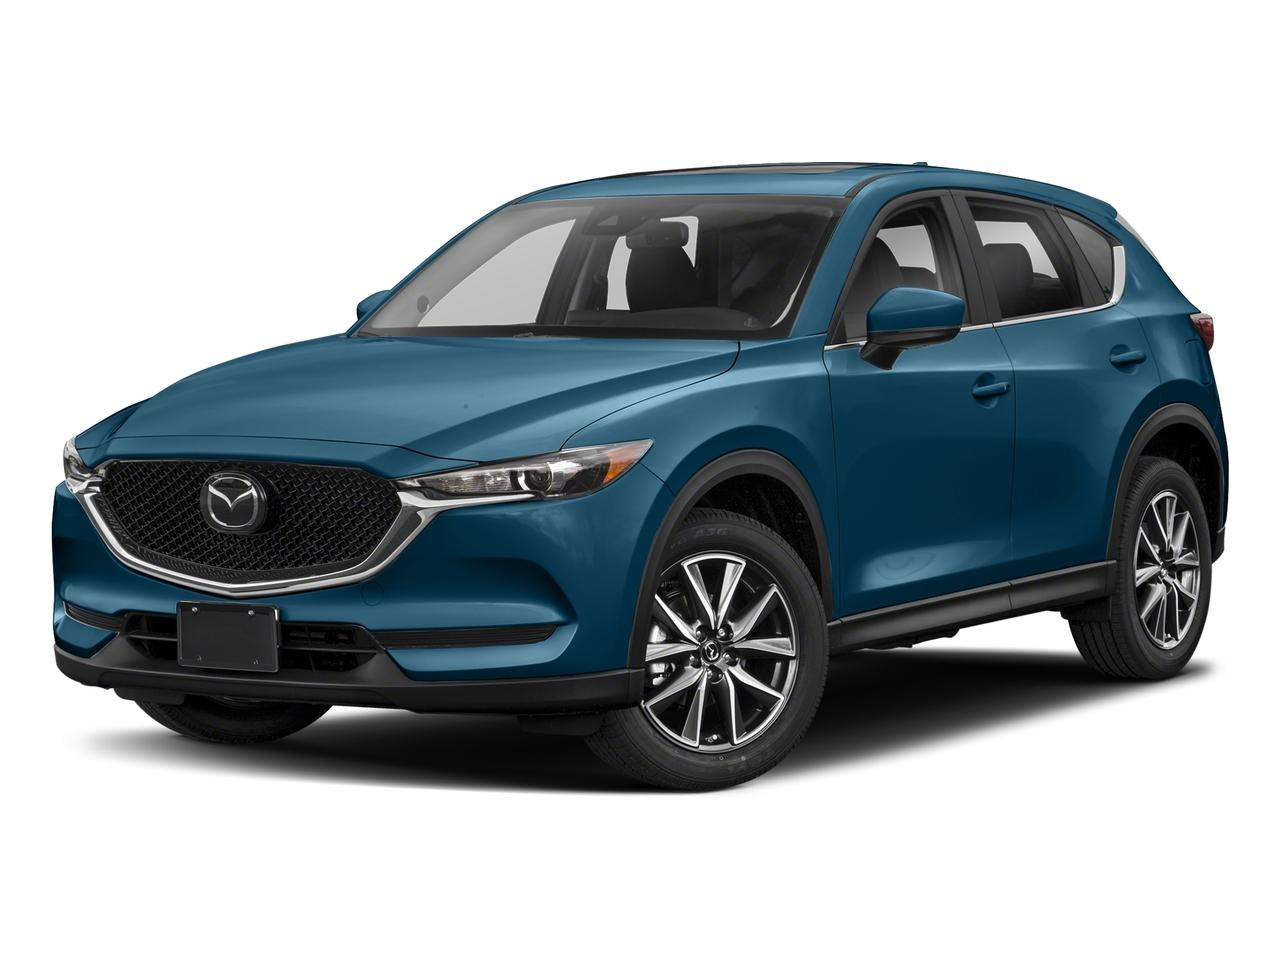 2018 Mazda CX-5 Vehicle Photo in Plainfield, IL 60586